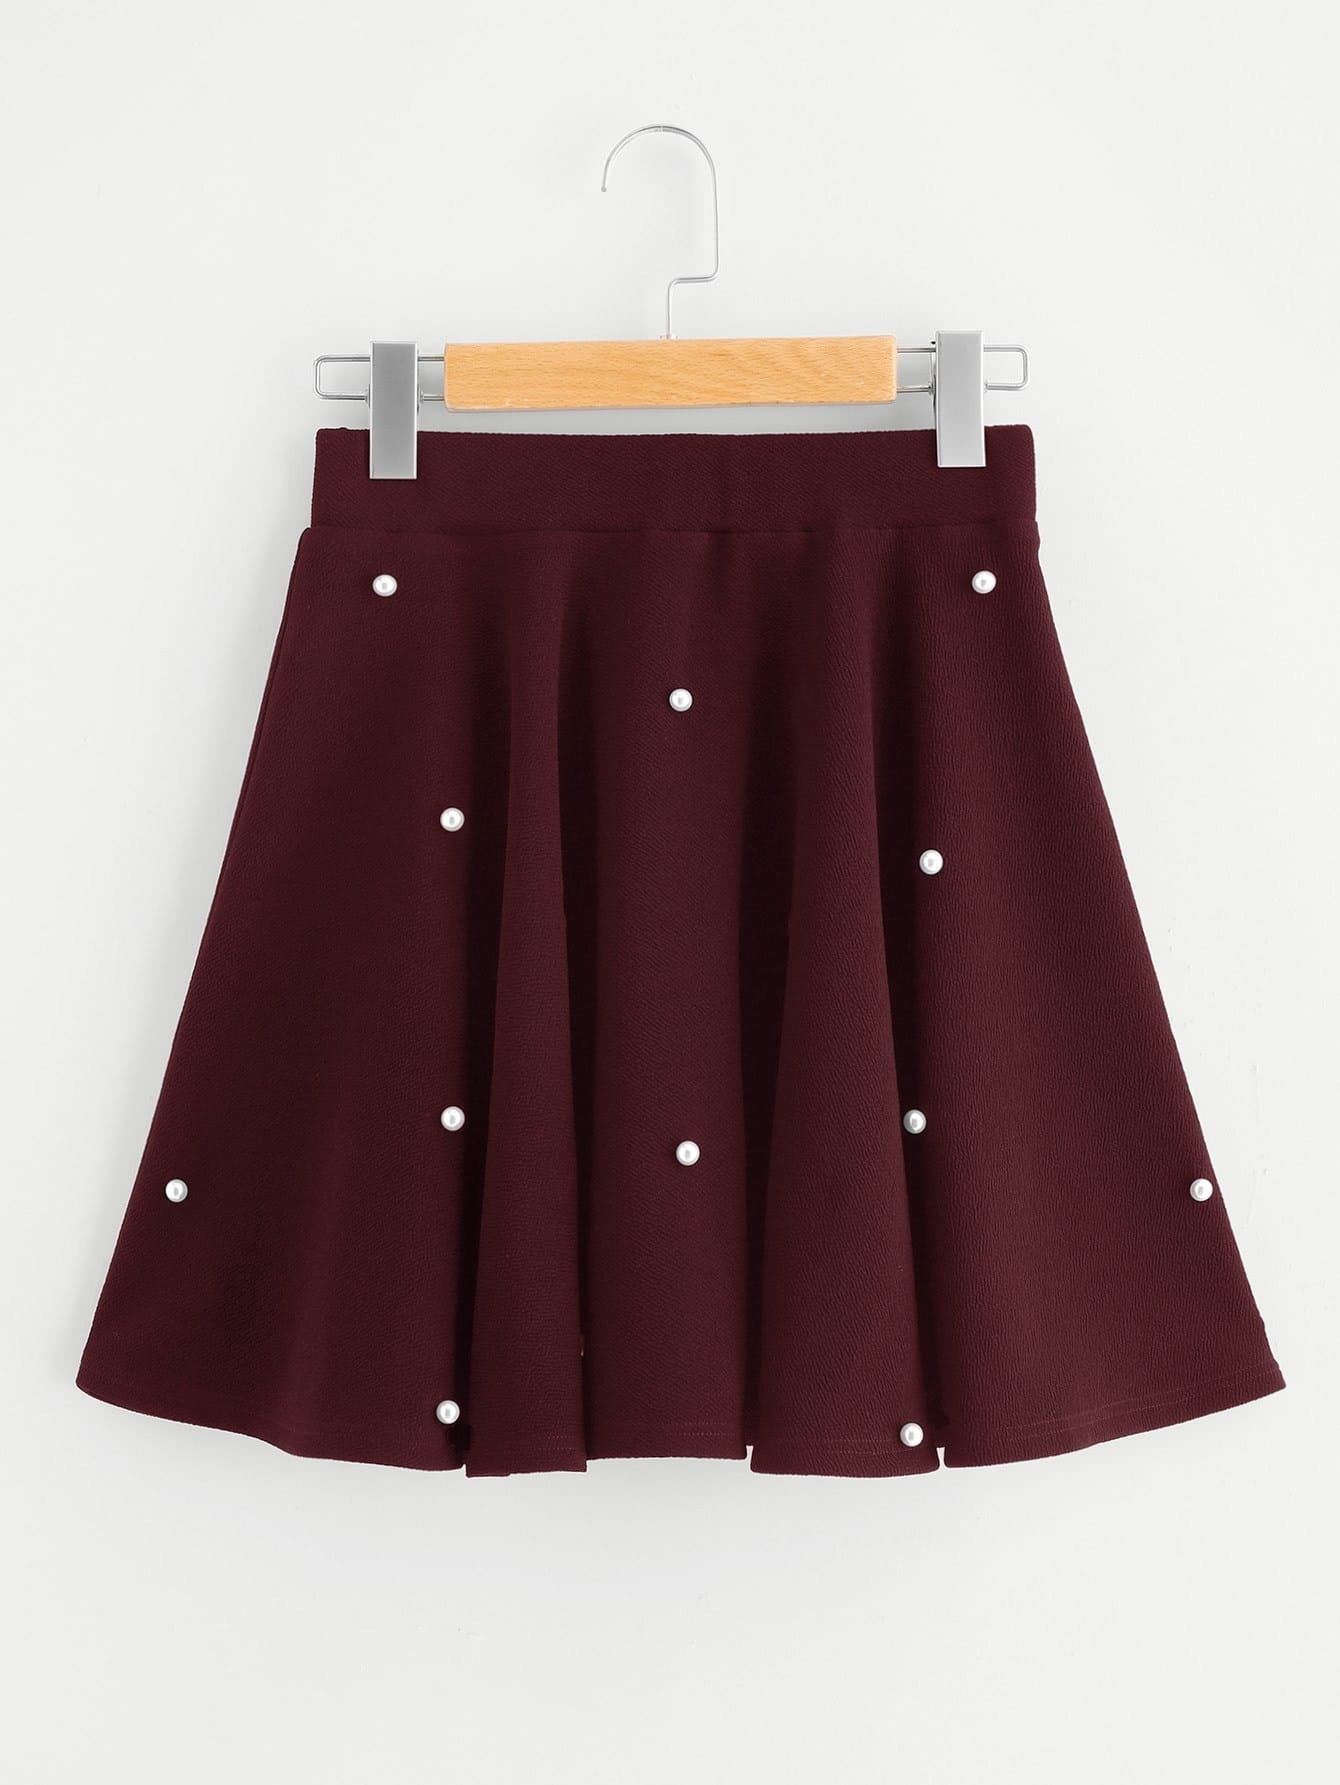 Pearl Embellished Textured Swing Skirt ornate print textured skirt